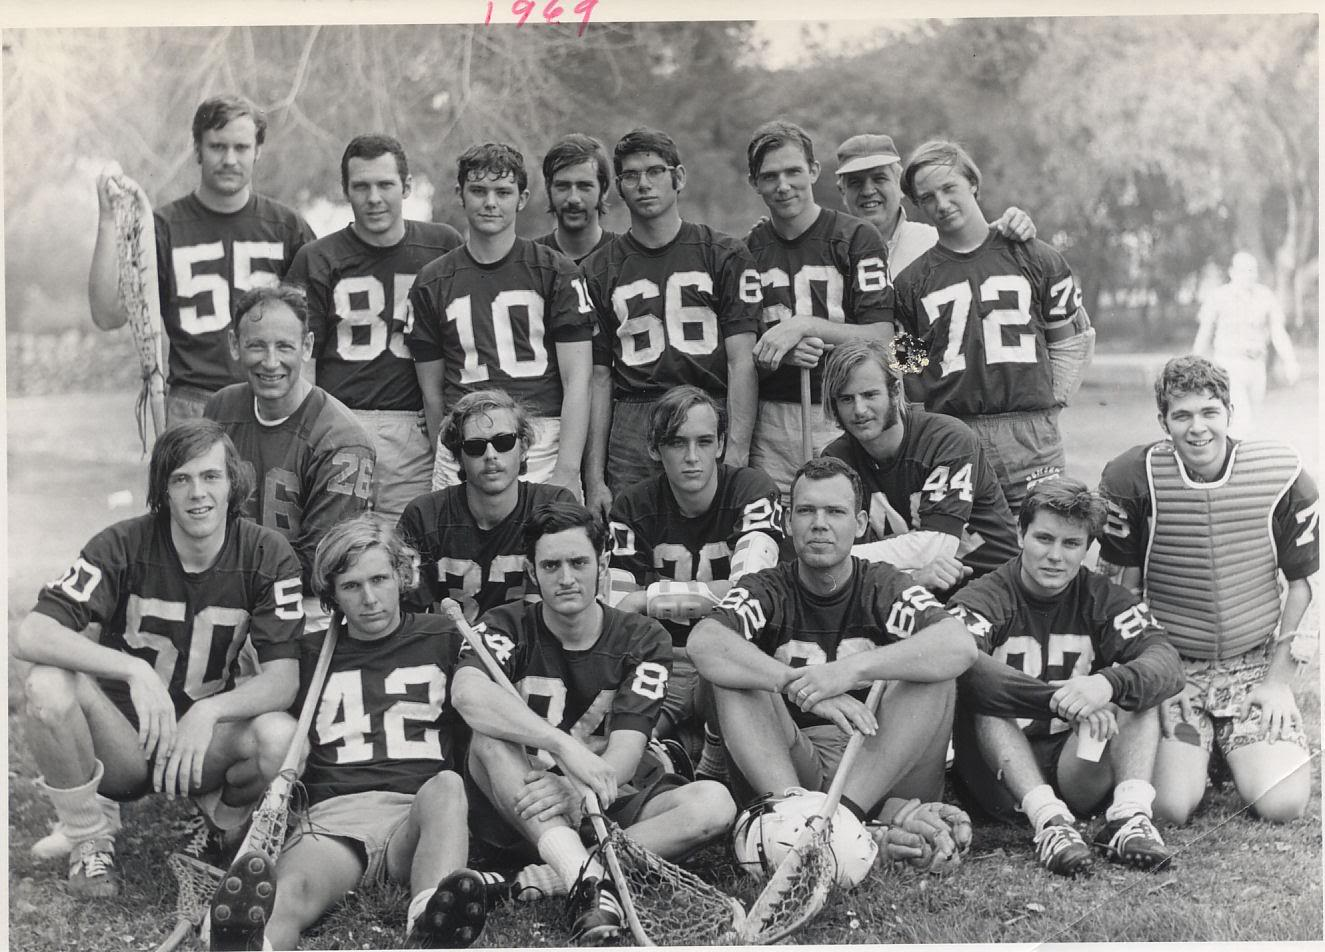 1969 team photo